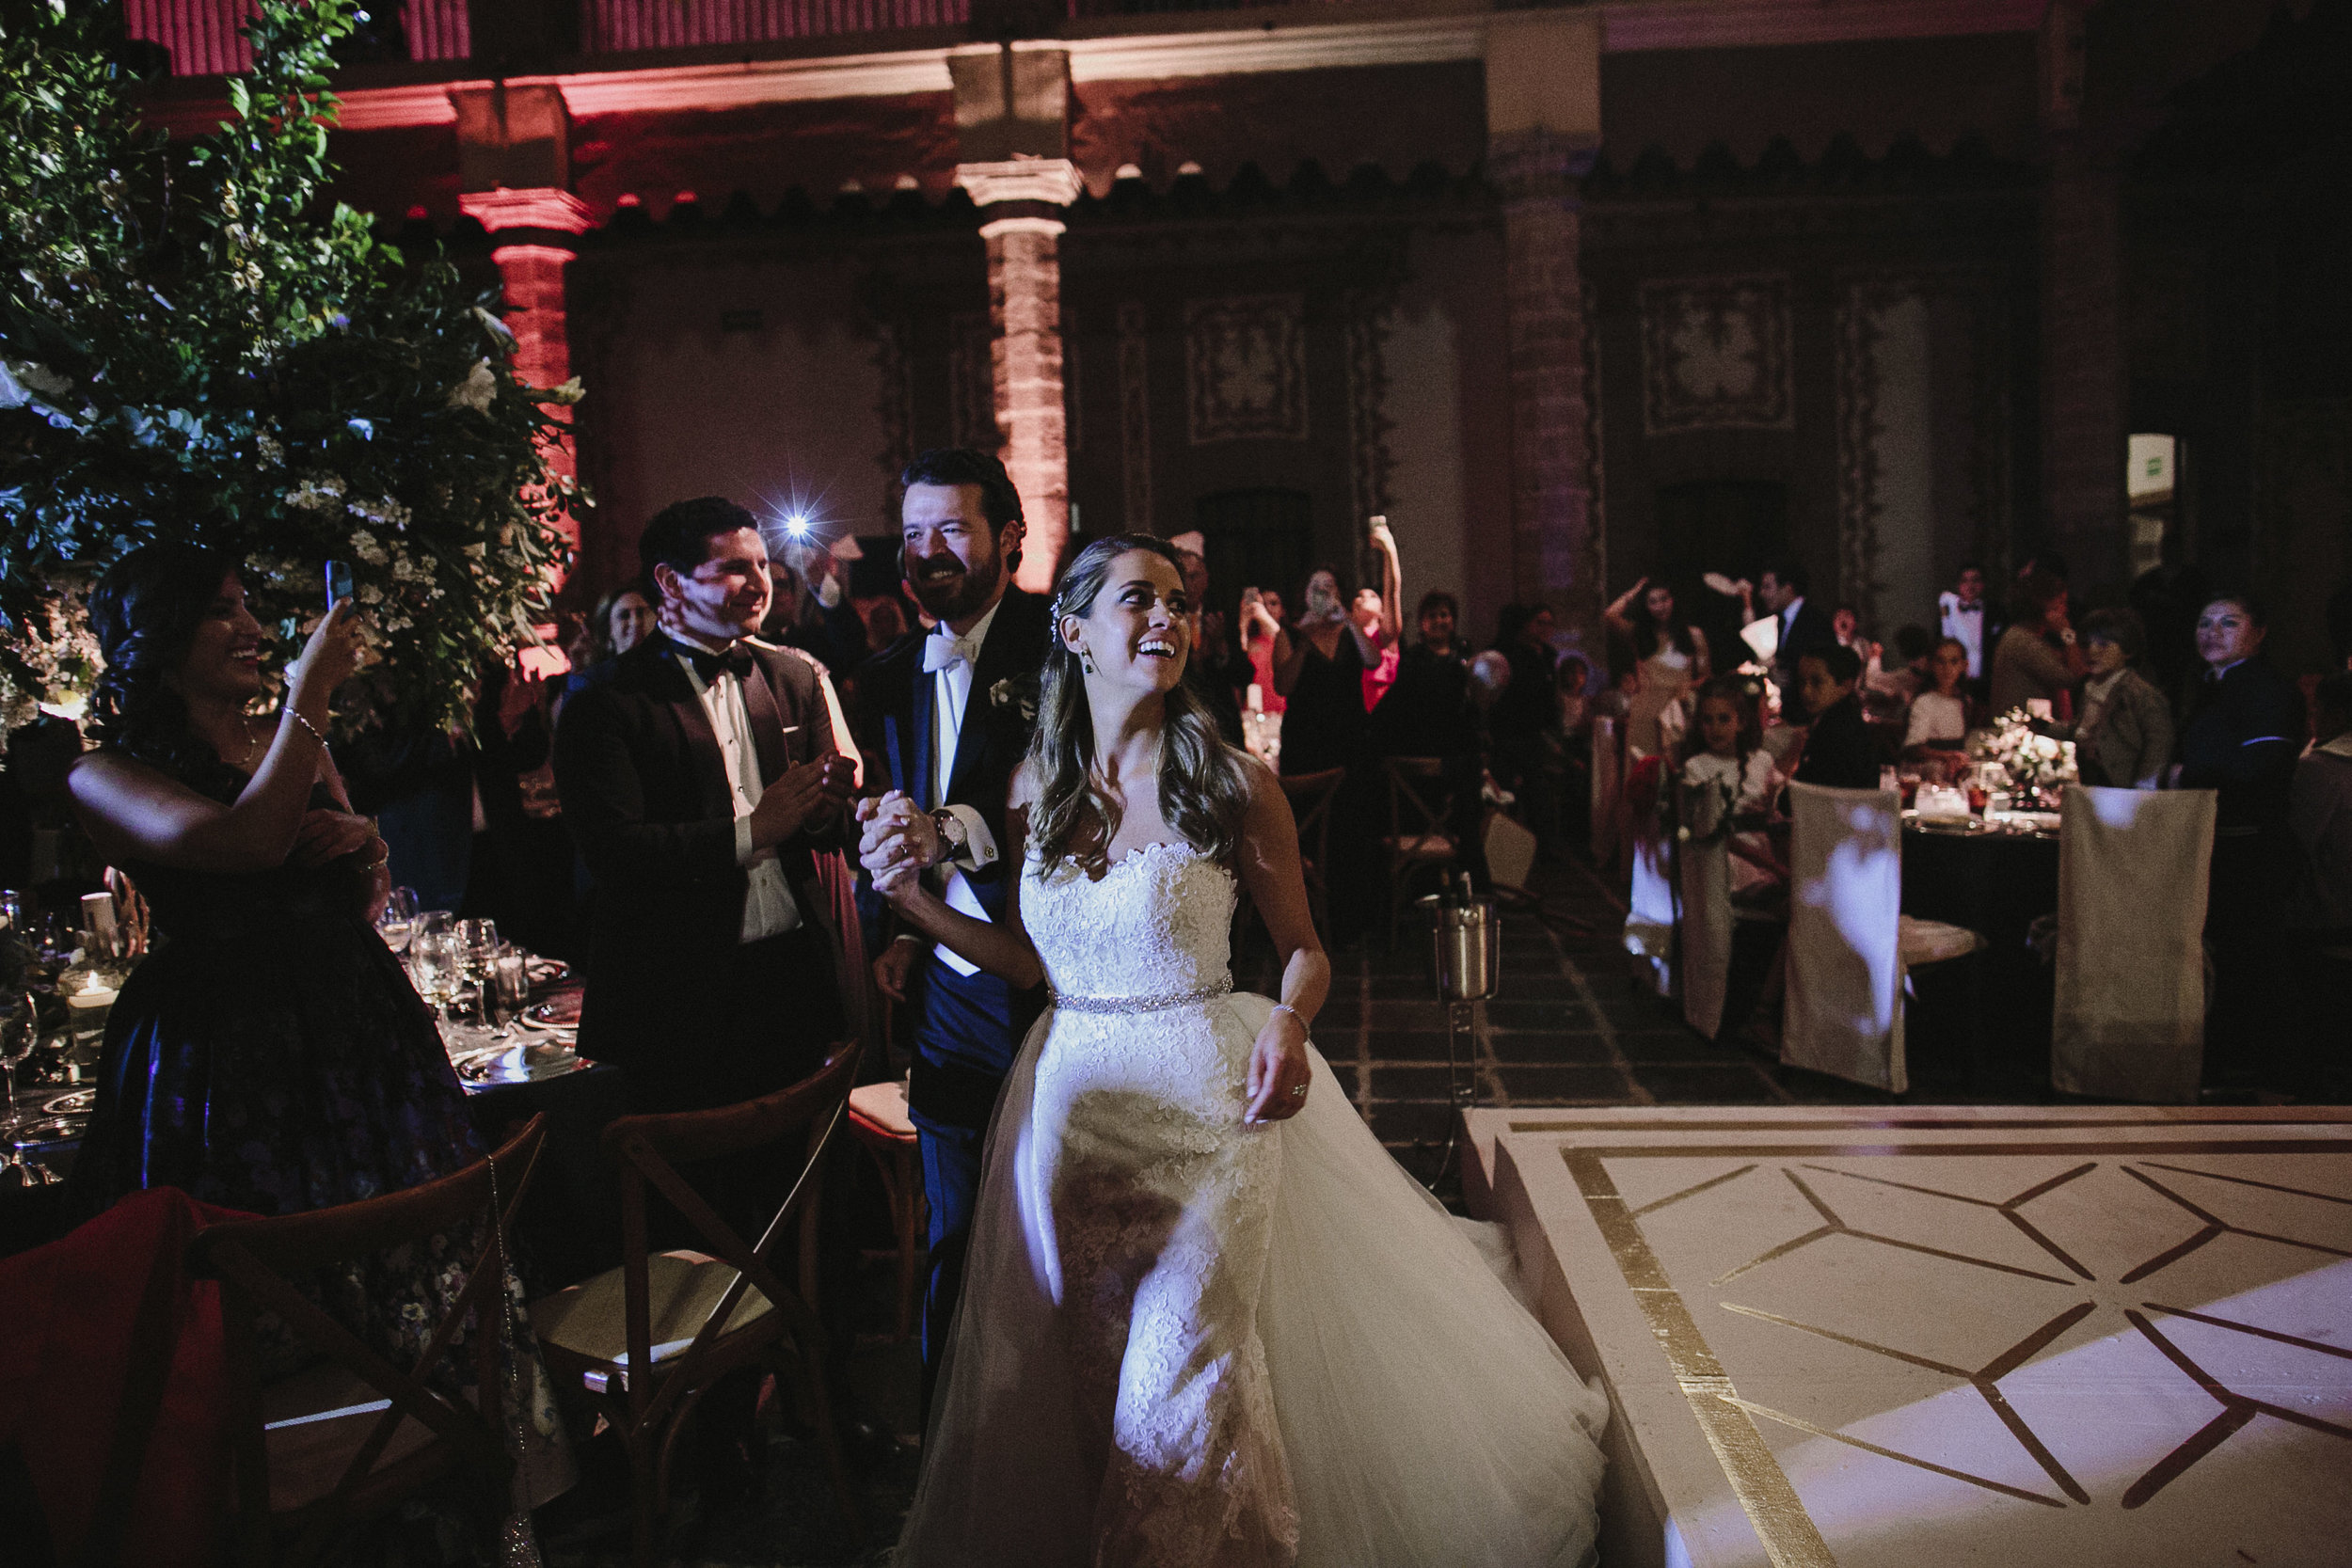 alfonso_flores_destination_wedding_photogrpahy_paola_alonso-865.JPG